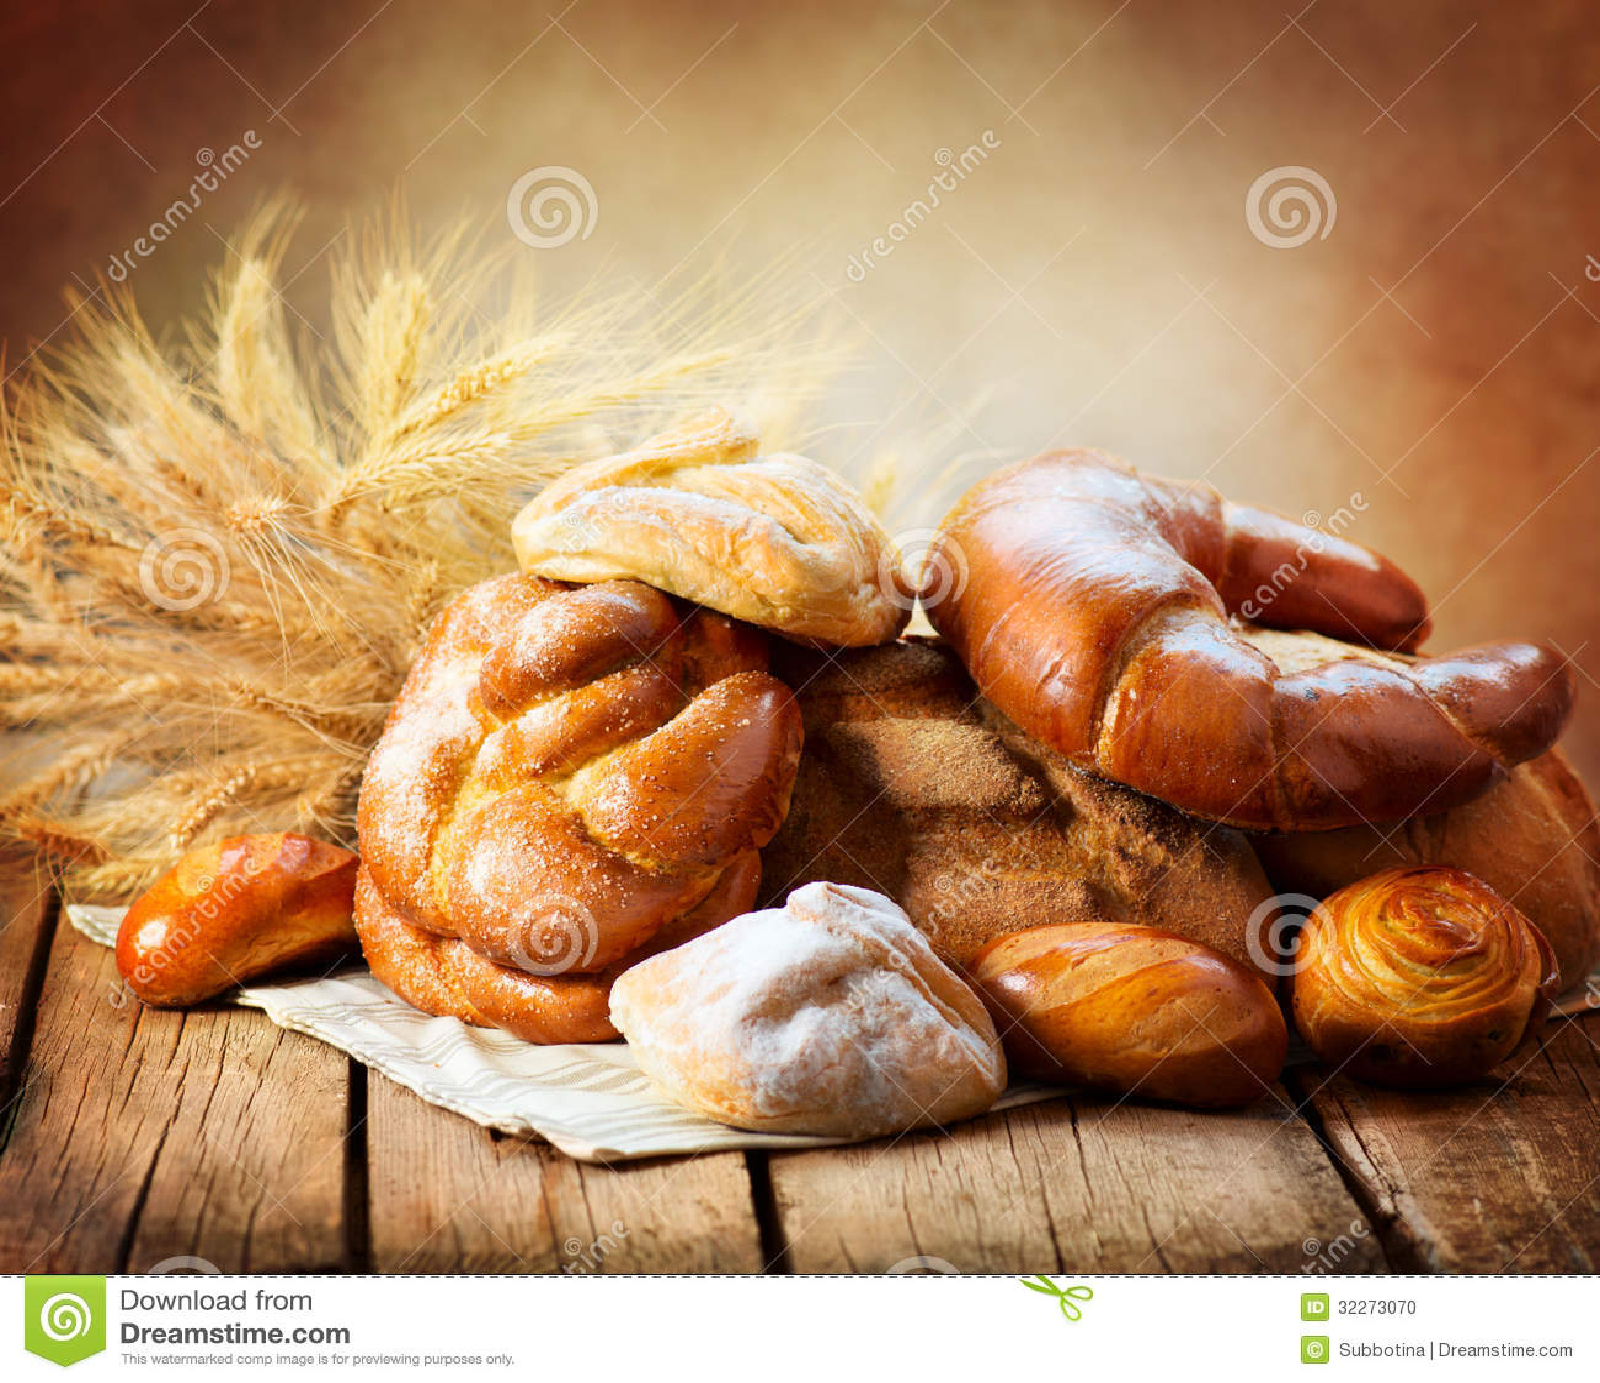 Хлеб хлебопекарни на деревянной таблице